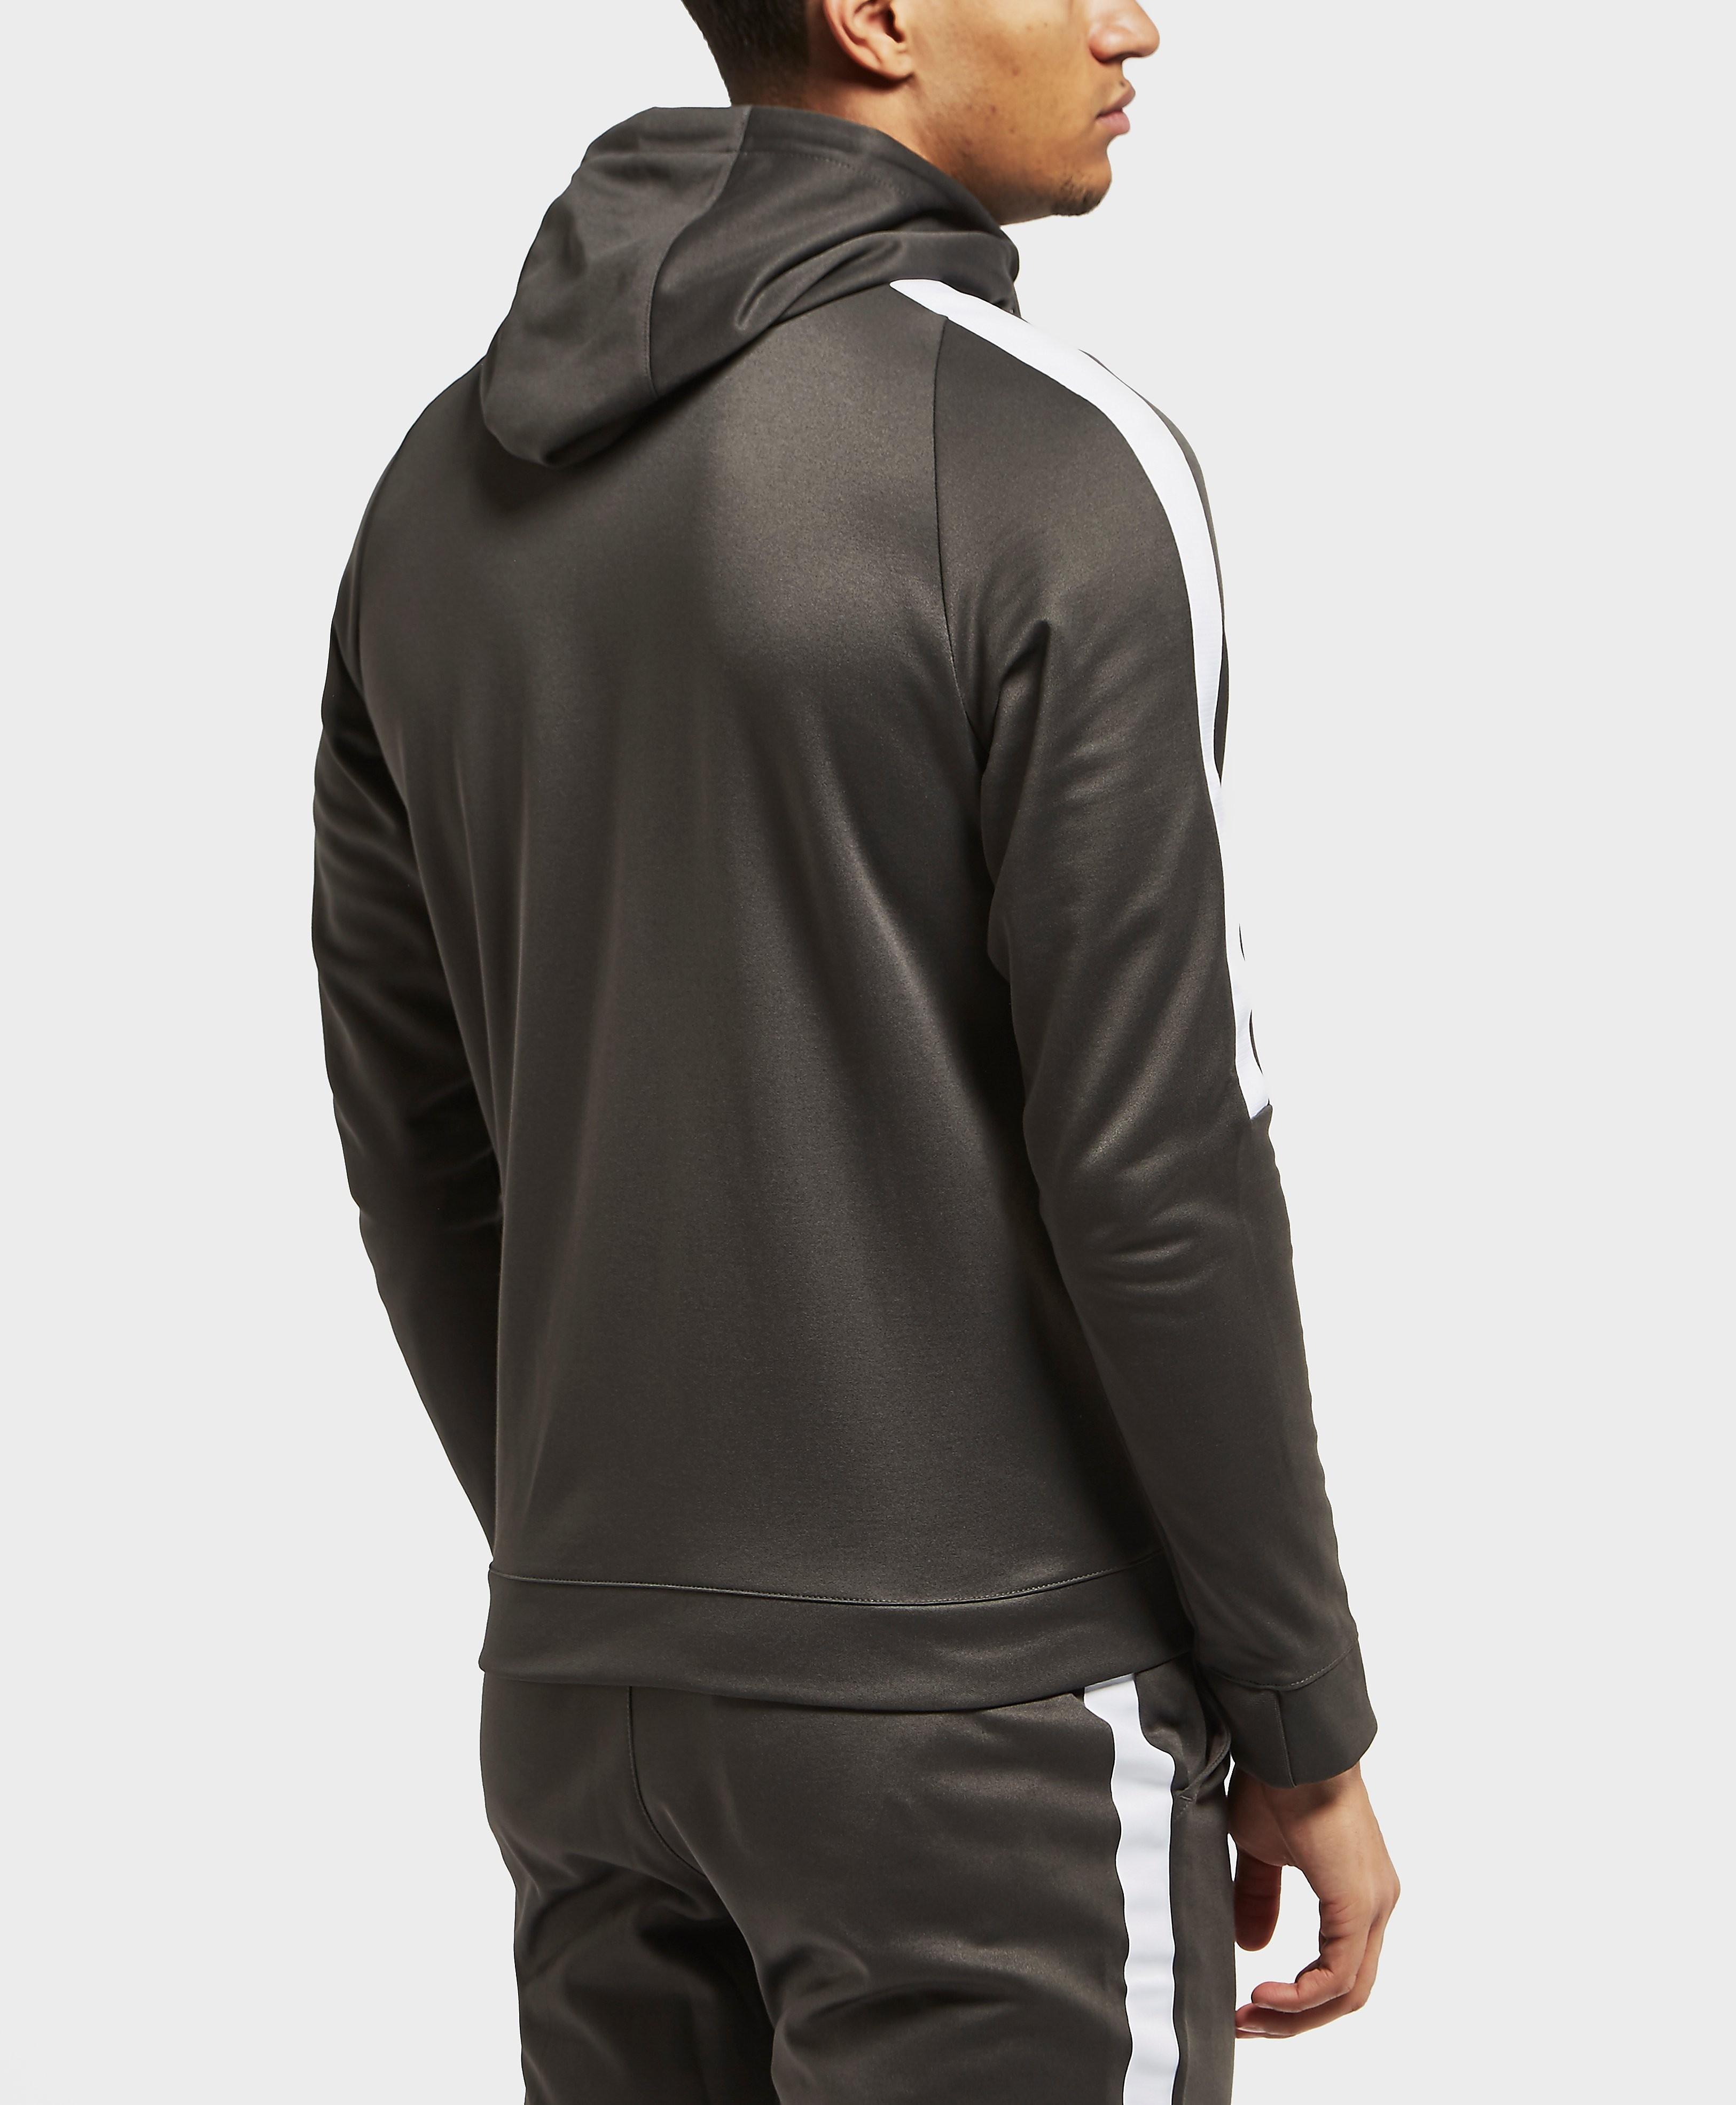 Nike Tribute Full Zip Hoody